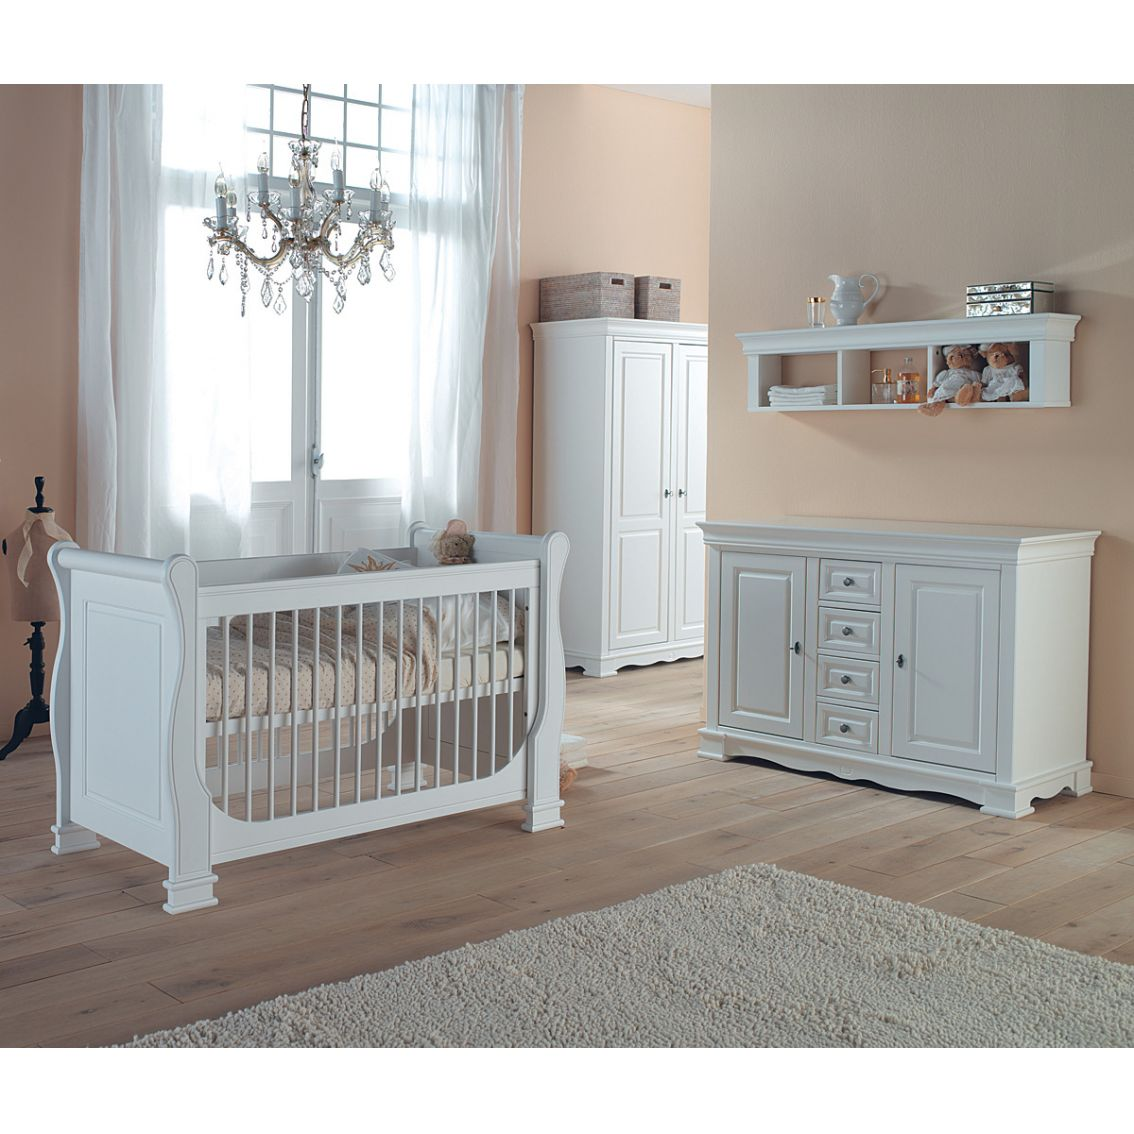 Baby Nursery Furniture Sets Uk - Baby Nursery And Kids Room